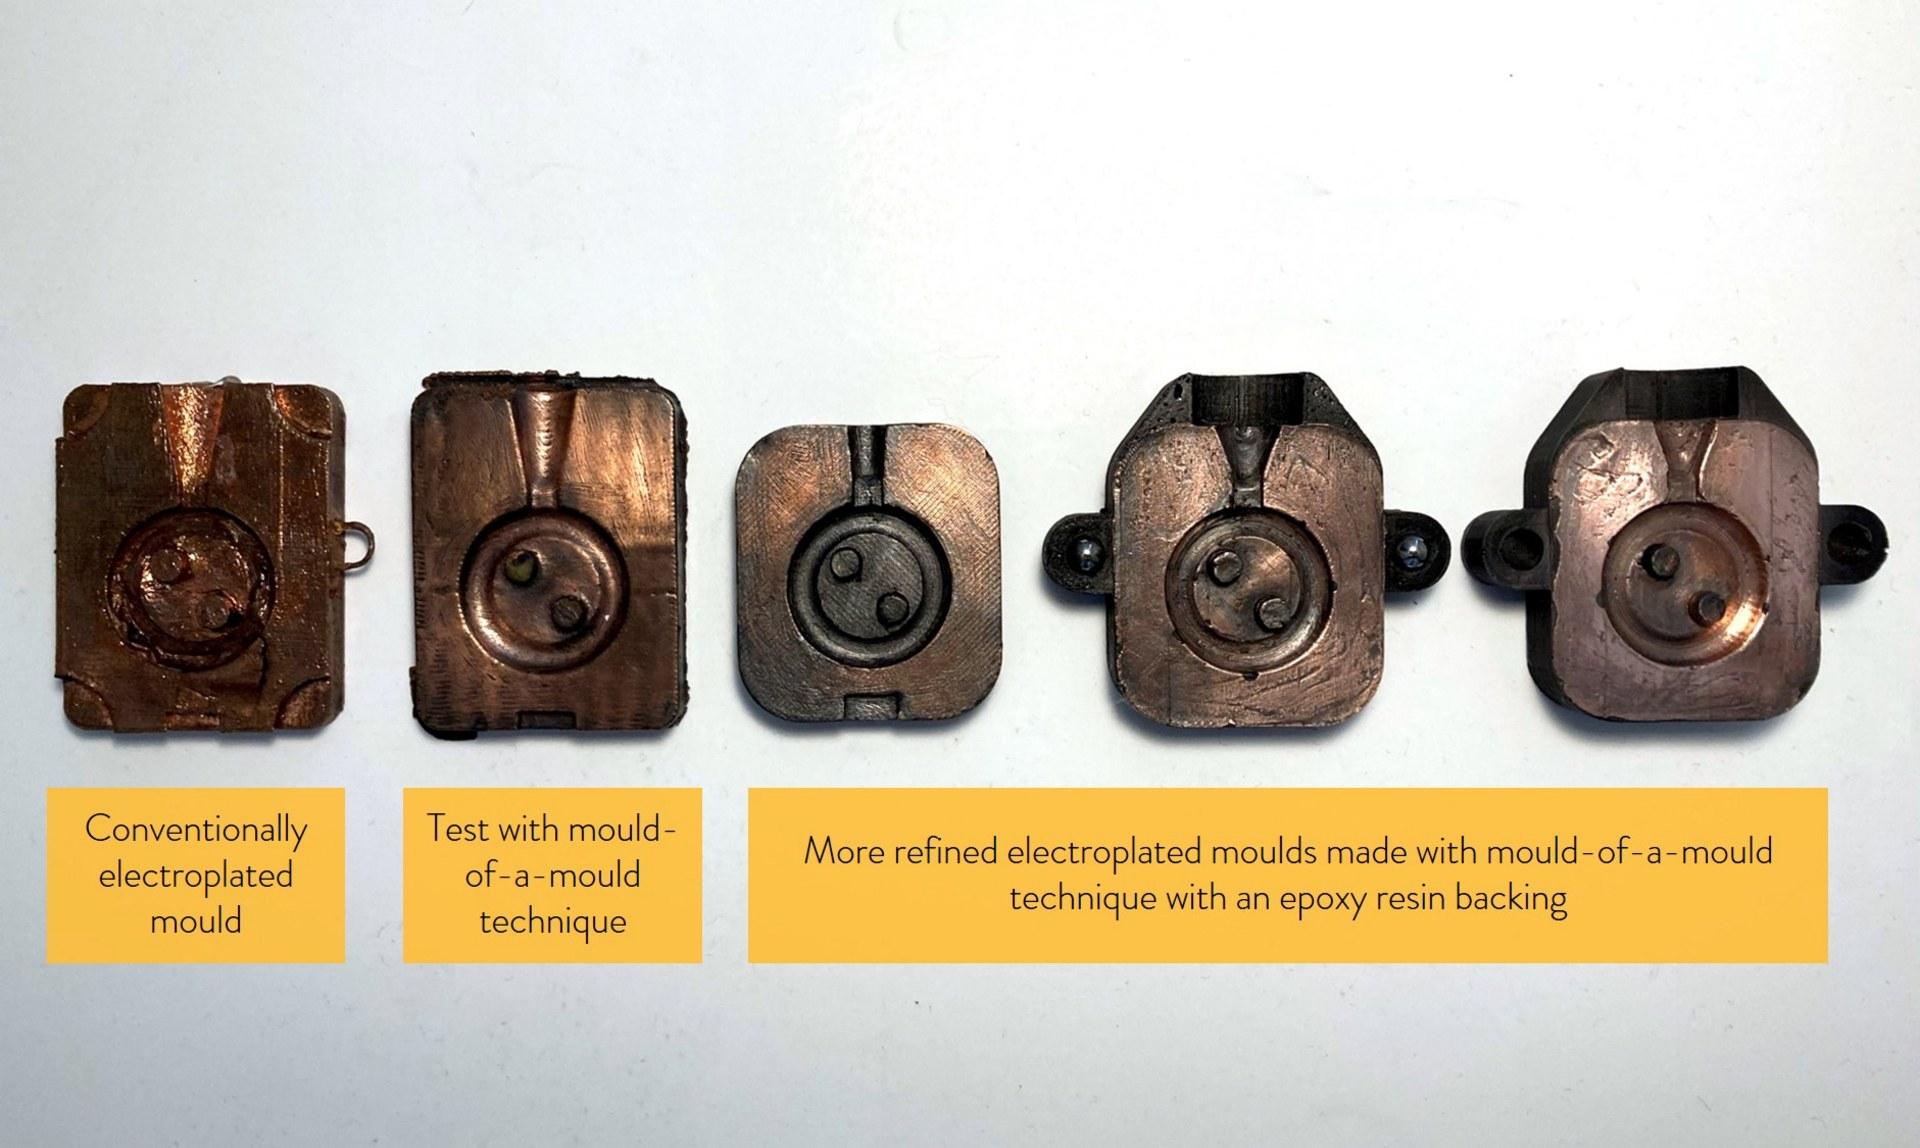 Metal plating moulds